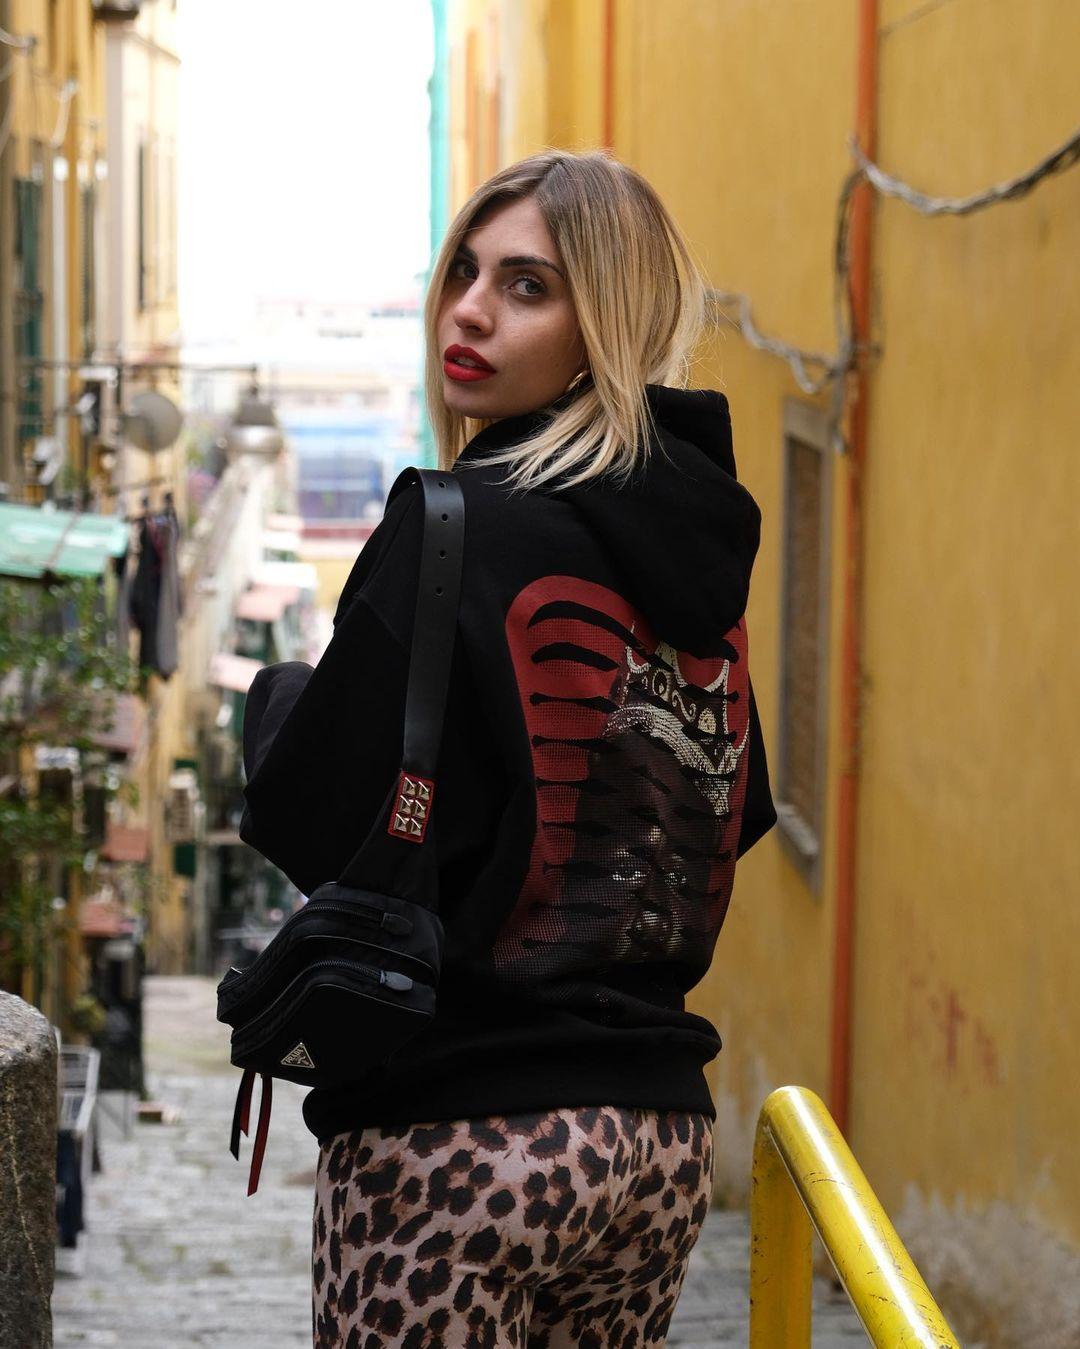 Ludovica-Melisurgo-Wallpapers-Insta-Fit-BIo-5